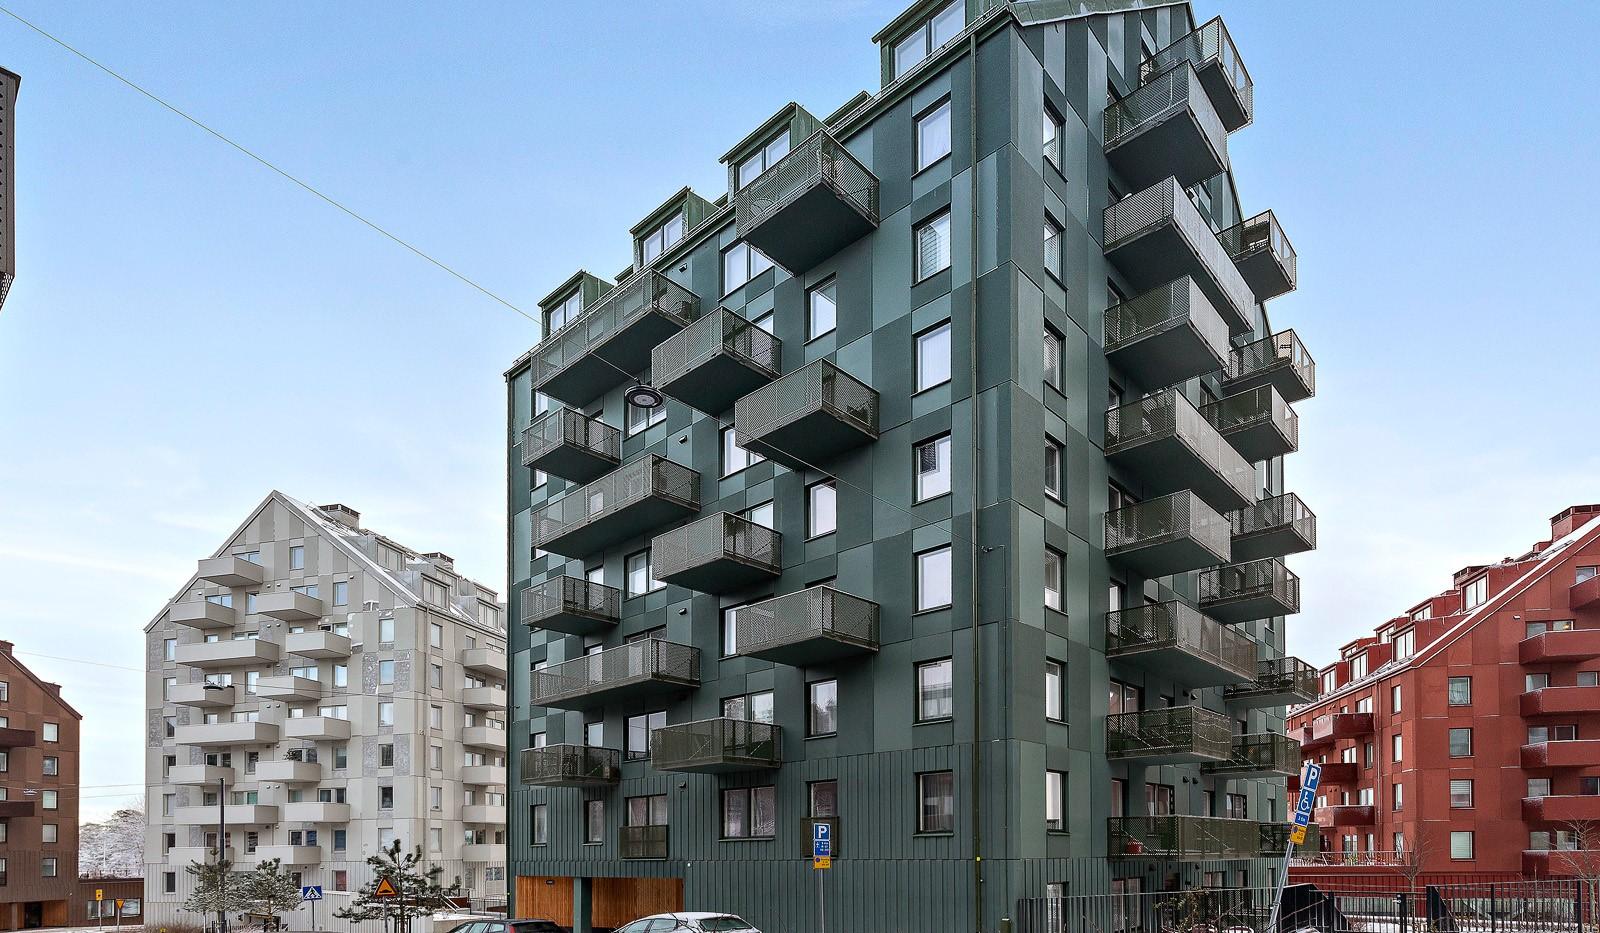 Lagmansbacken 3 - Fasad